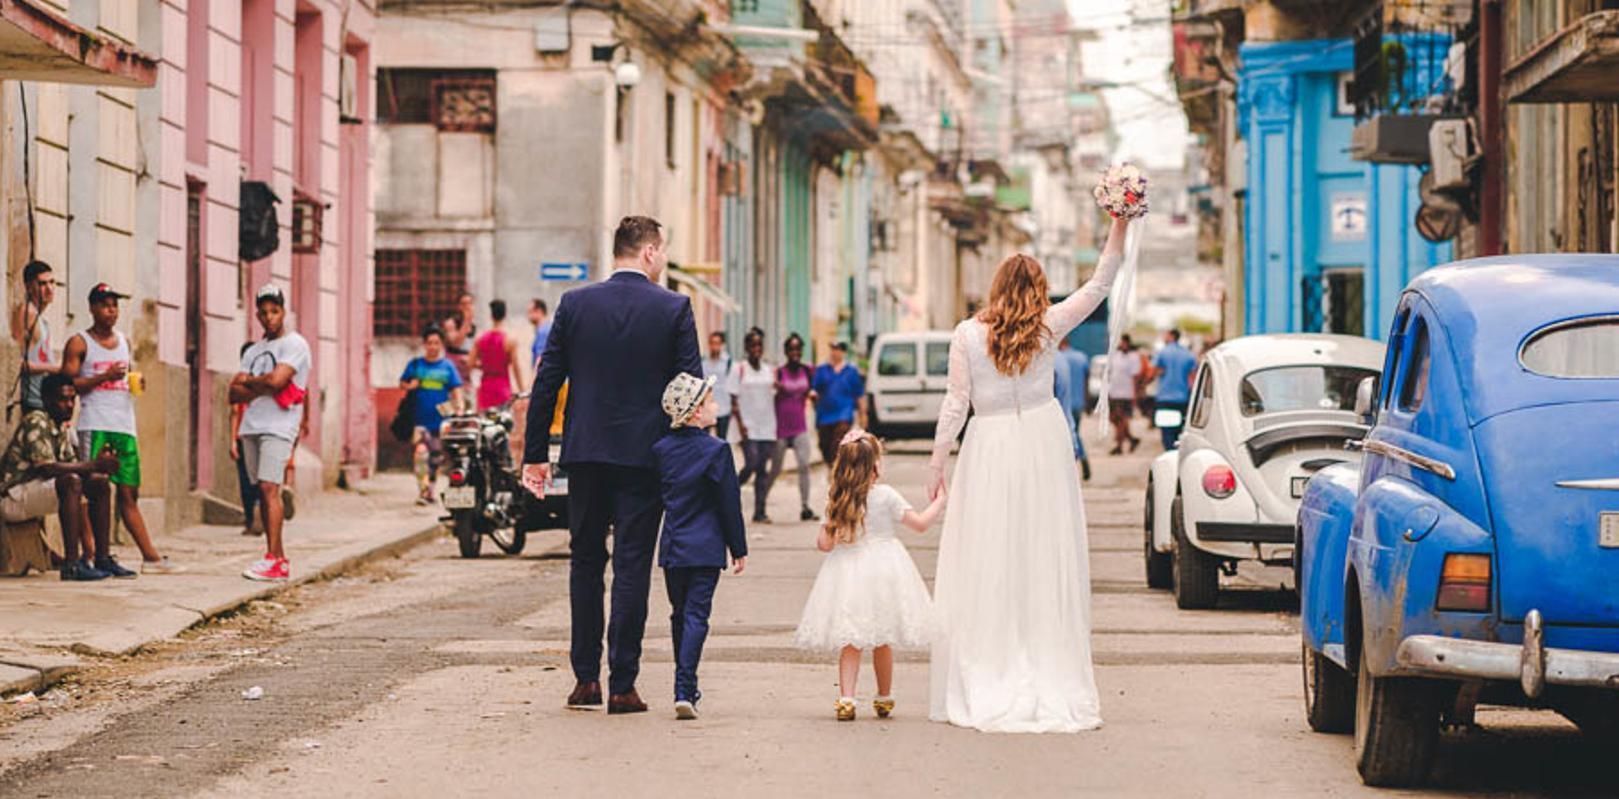 bodas-sin-clasificar-sin-tema-cuba-42392.jpg